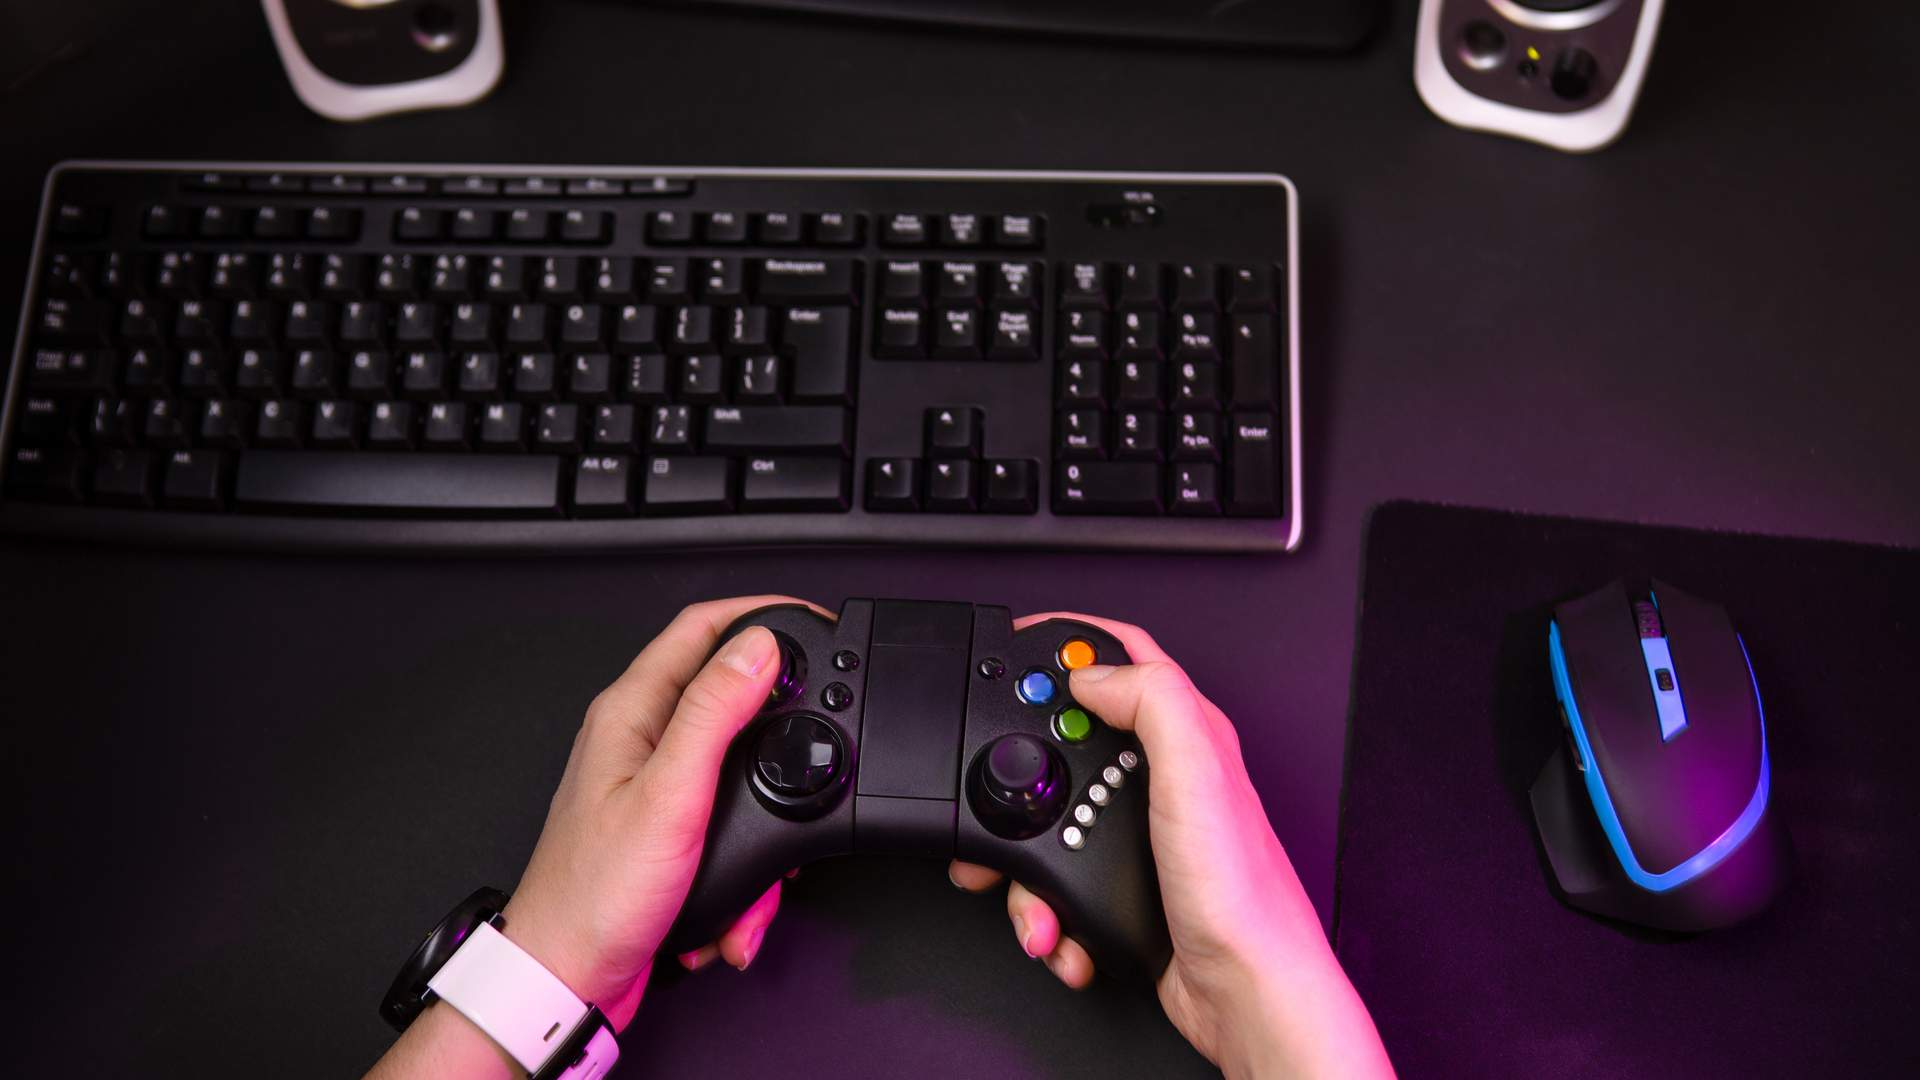 Mesa preta com teclado, mouse e controle de videogame sendo segurado